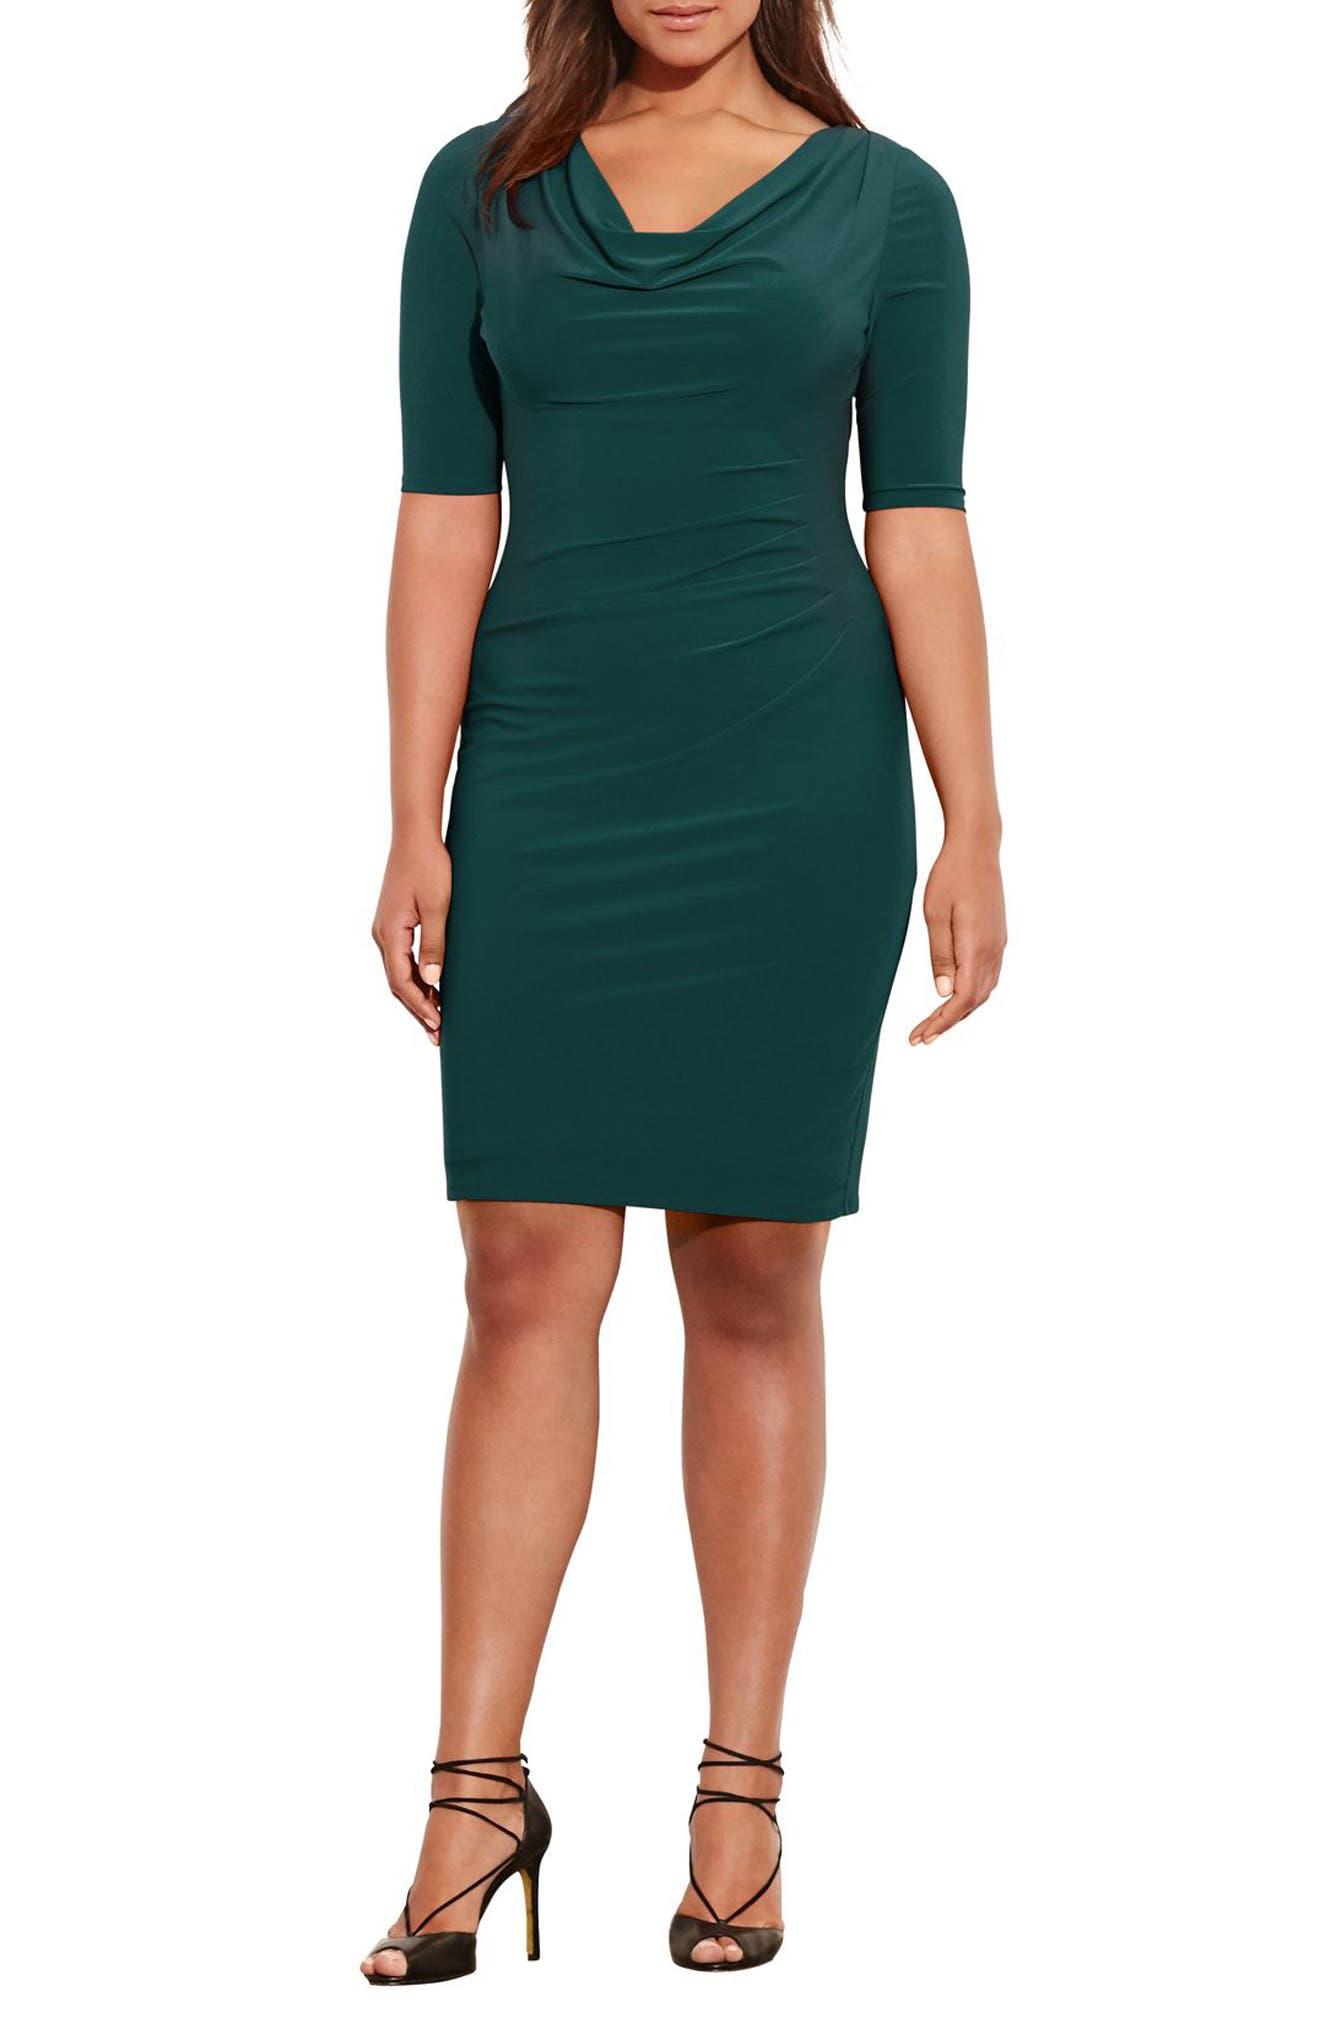 Main Image - Lauren Ralph Lauren Carleton Cowl Neck Jersey Dress (Plus Size)